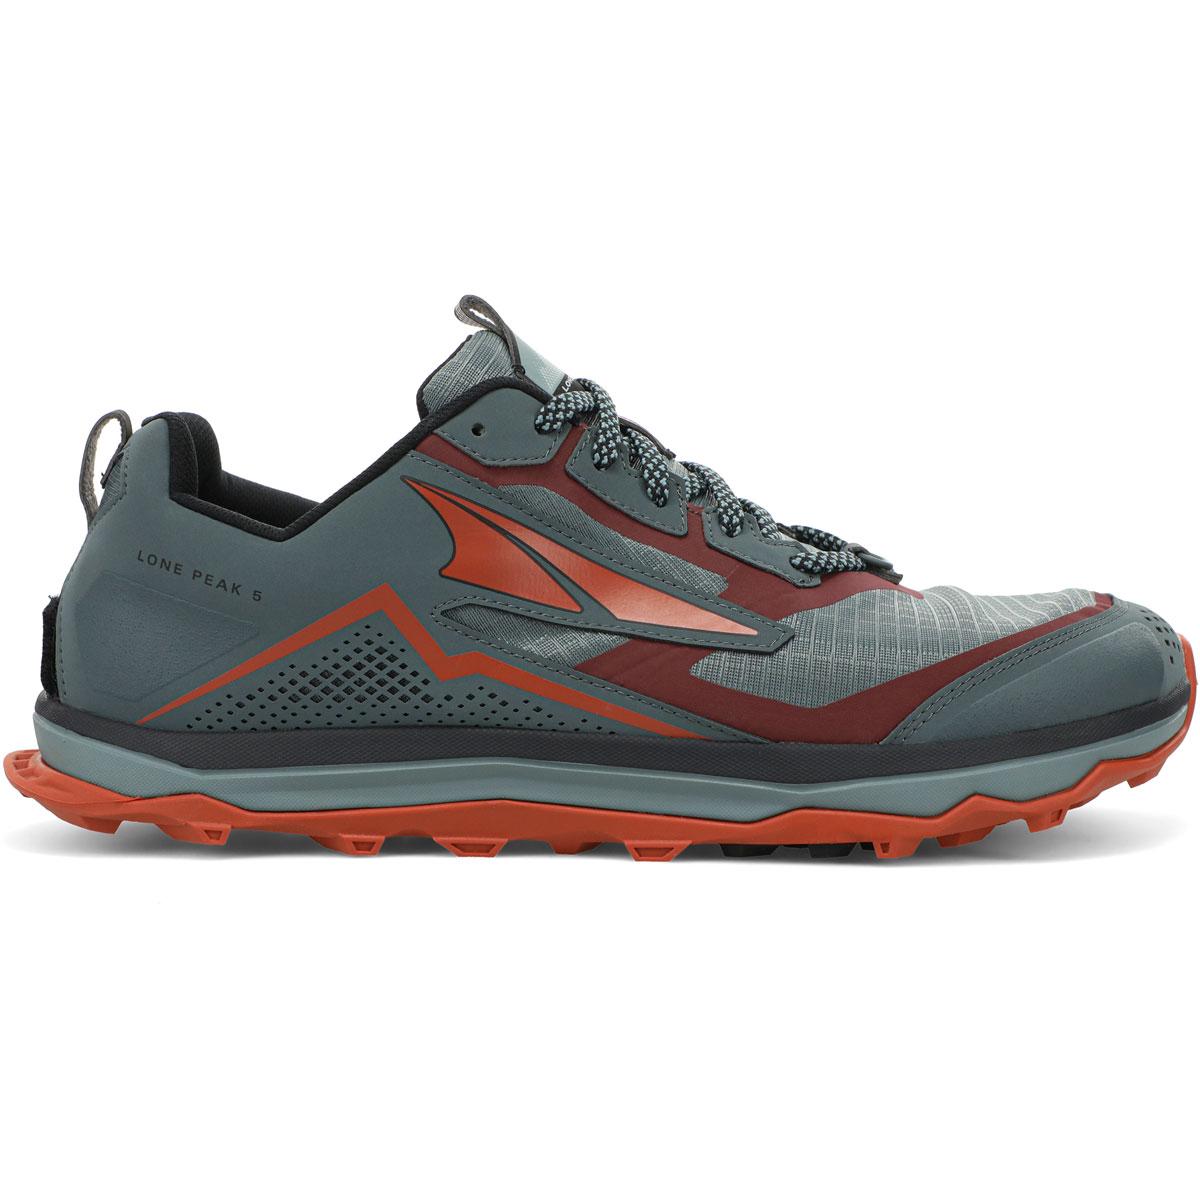 Men's Altra Lone Peak 5 Trail Running Shoe - Color: Gray/Orange - Size: 7 - Width: Regular, Gray/Orange, large, image 1